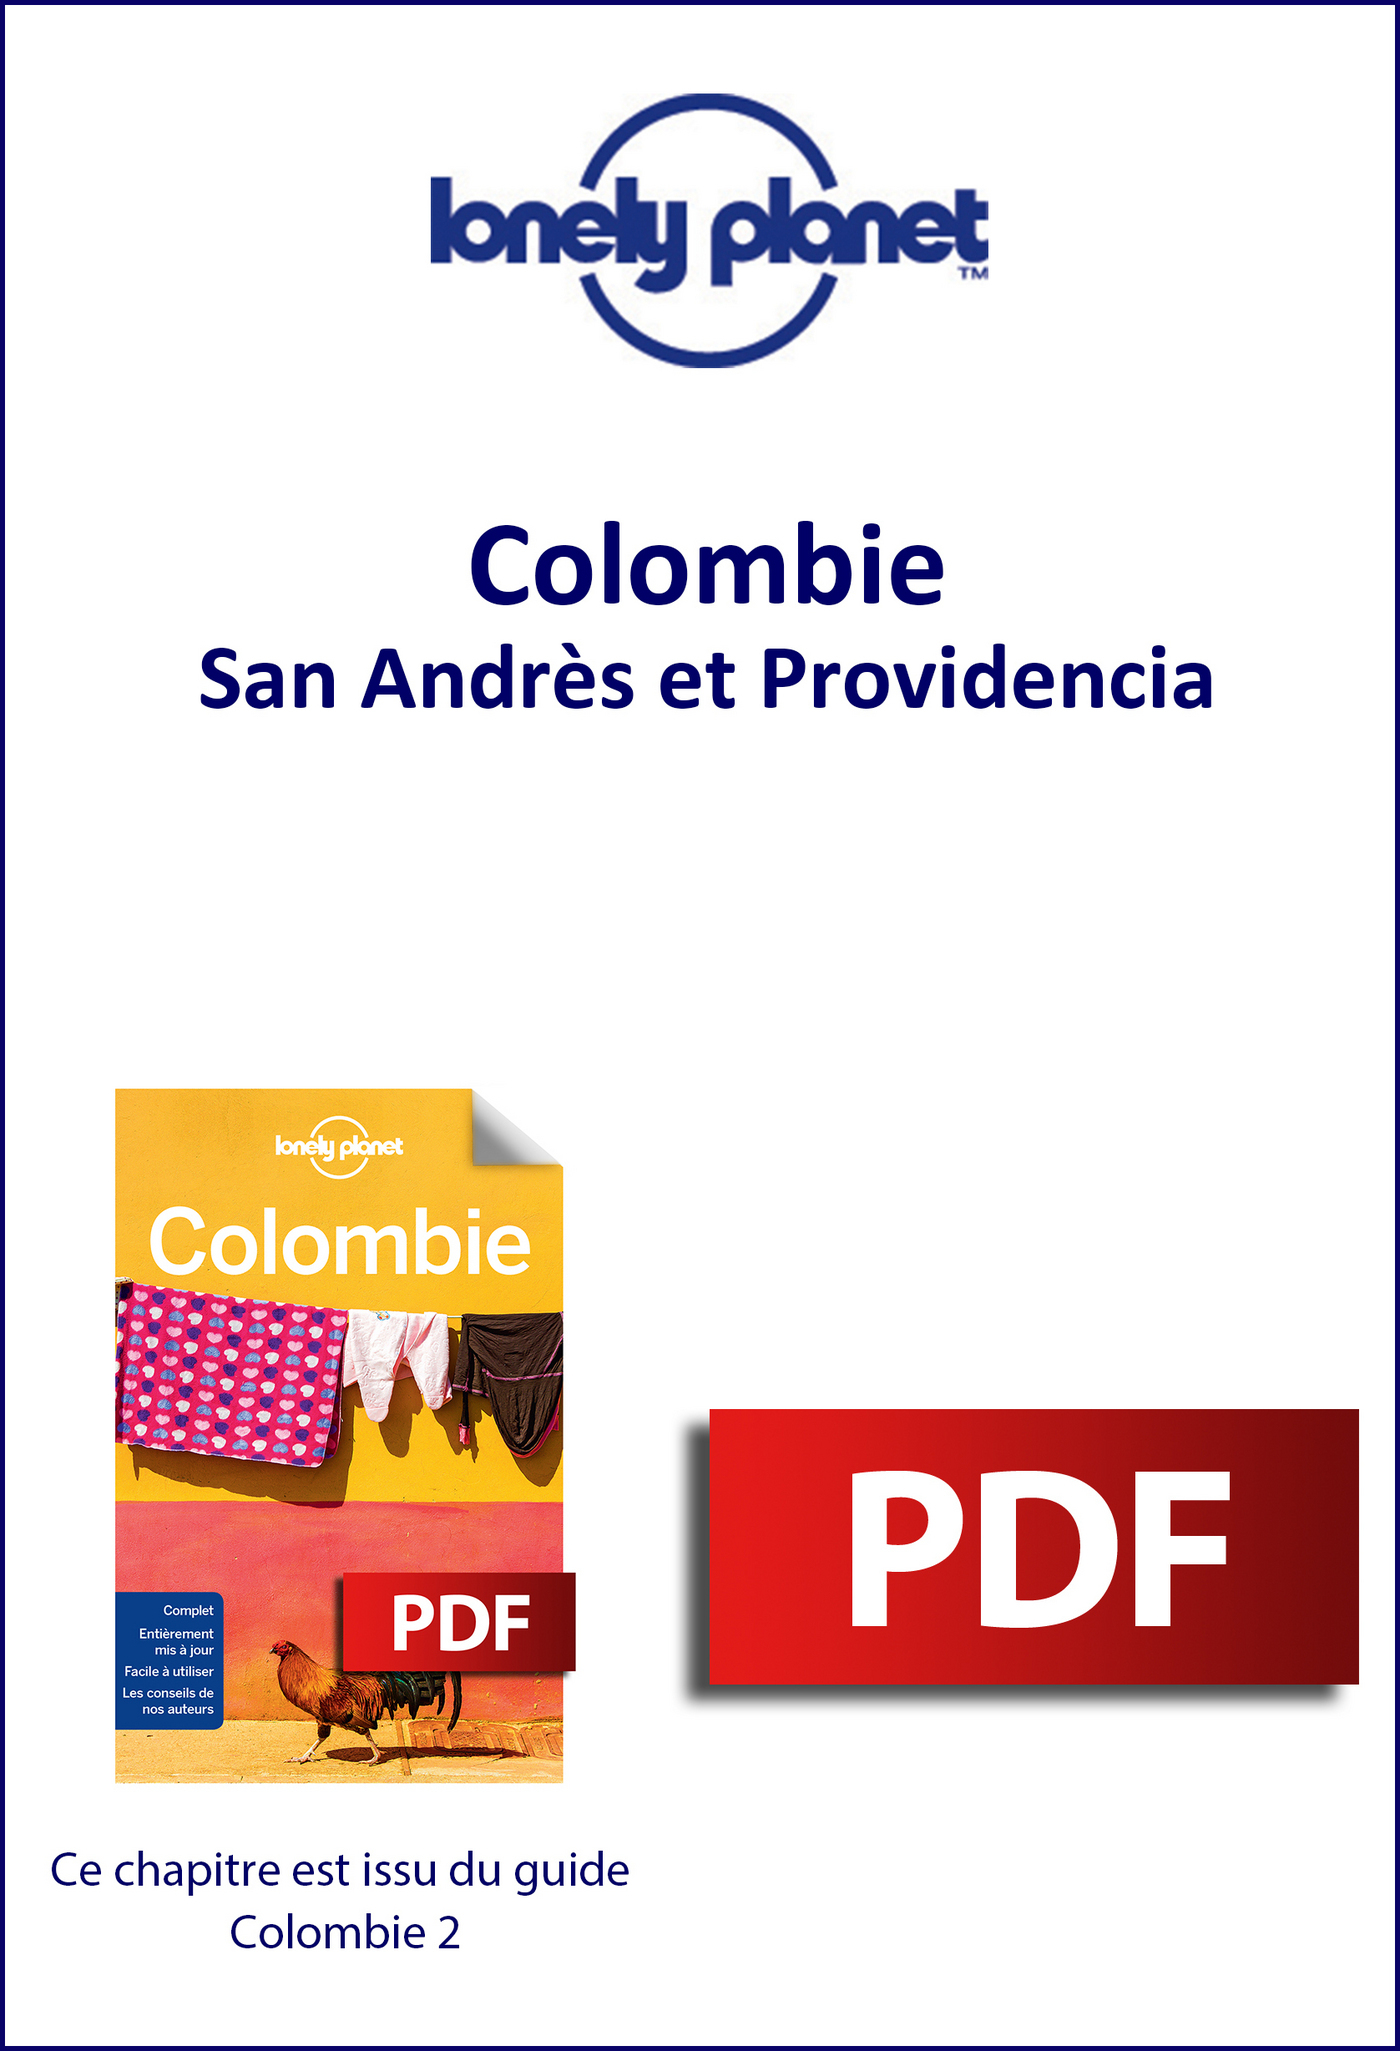 Colombie - San Andrès et Providencia